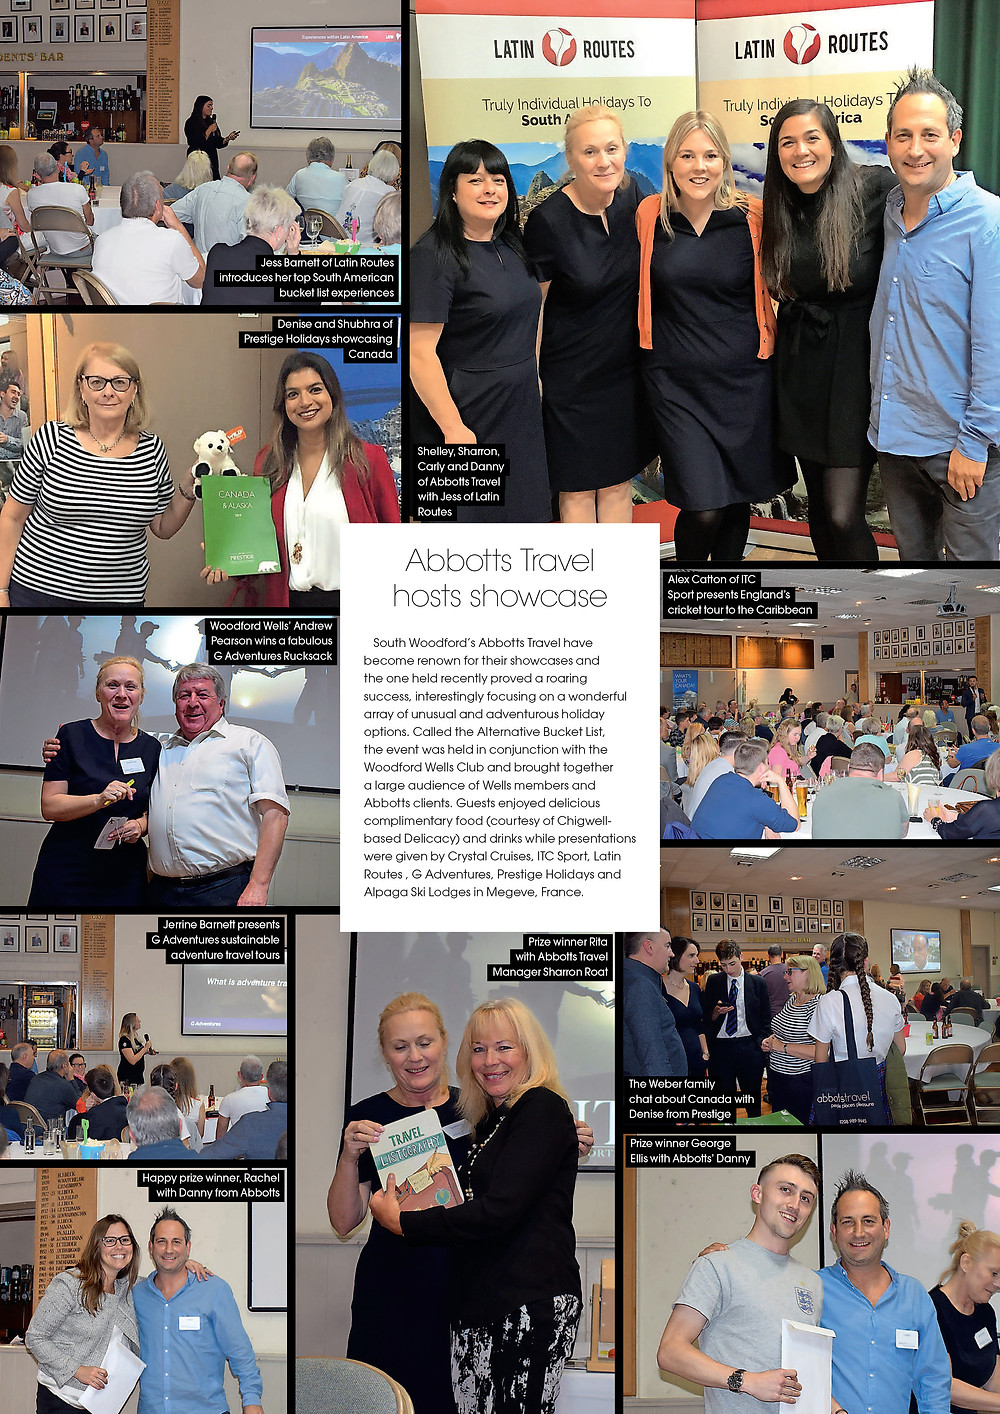 Abbotts Travel hosts showcase, West Essex Life